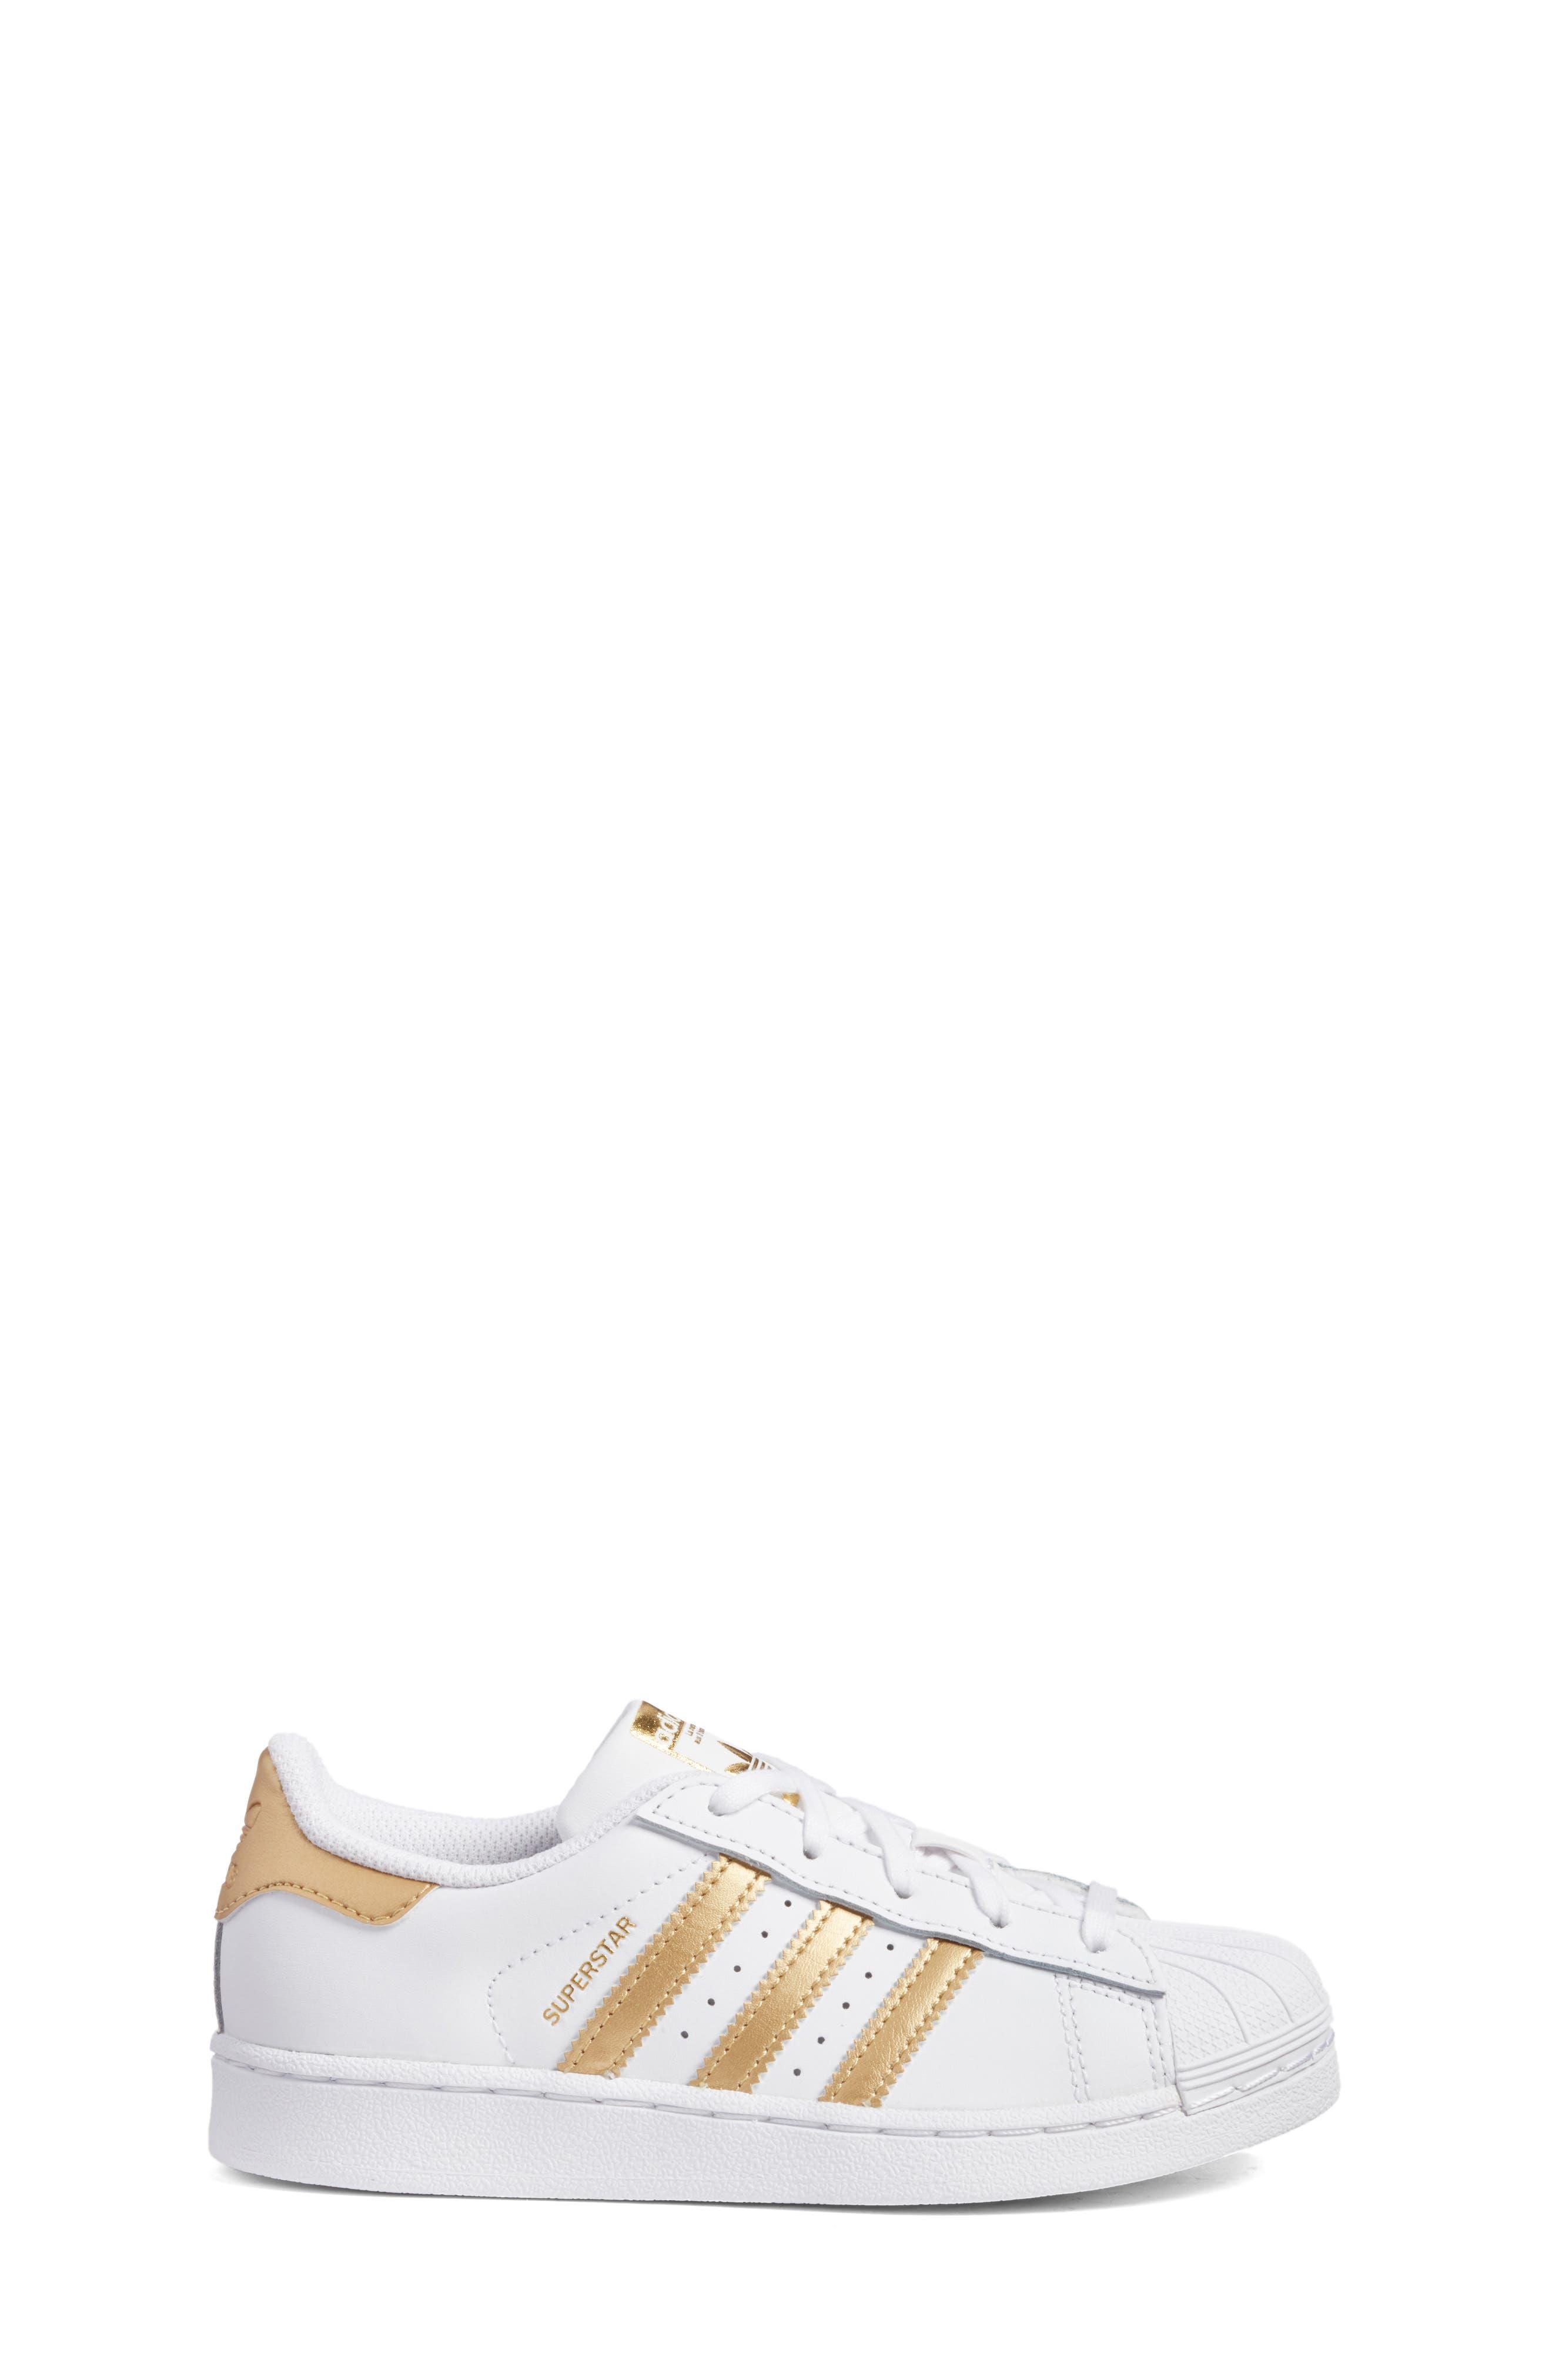 Alternate Image 3  - adidas Superstar C Sneaker (Toddler & Little Kid)